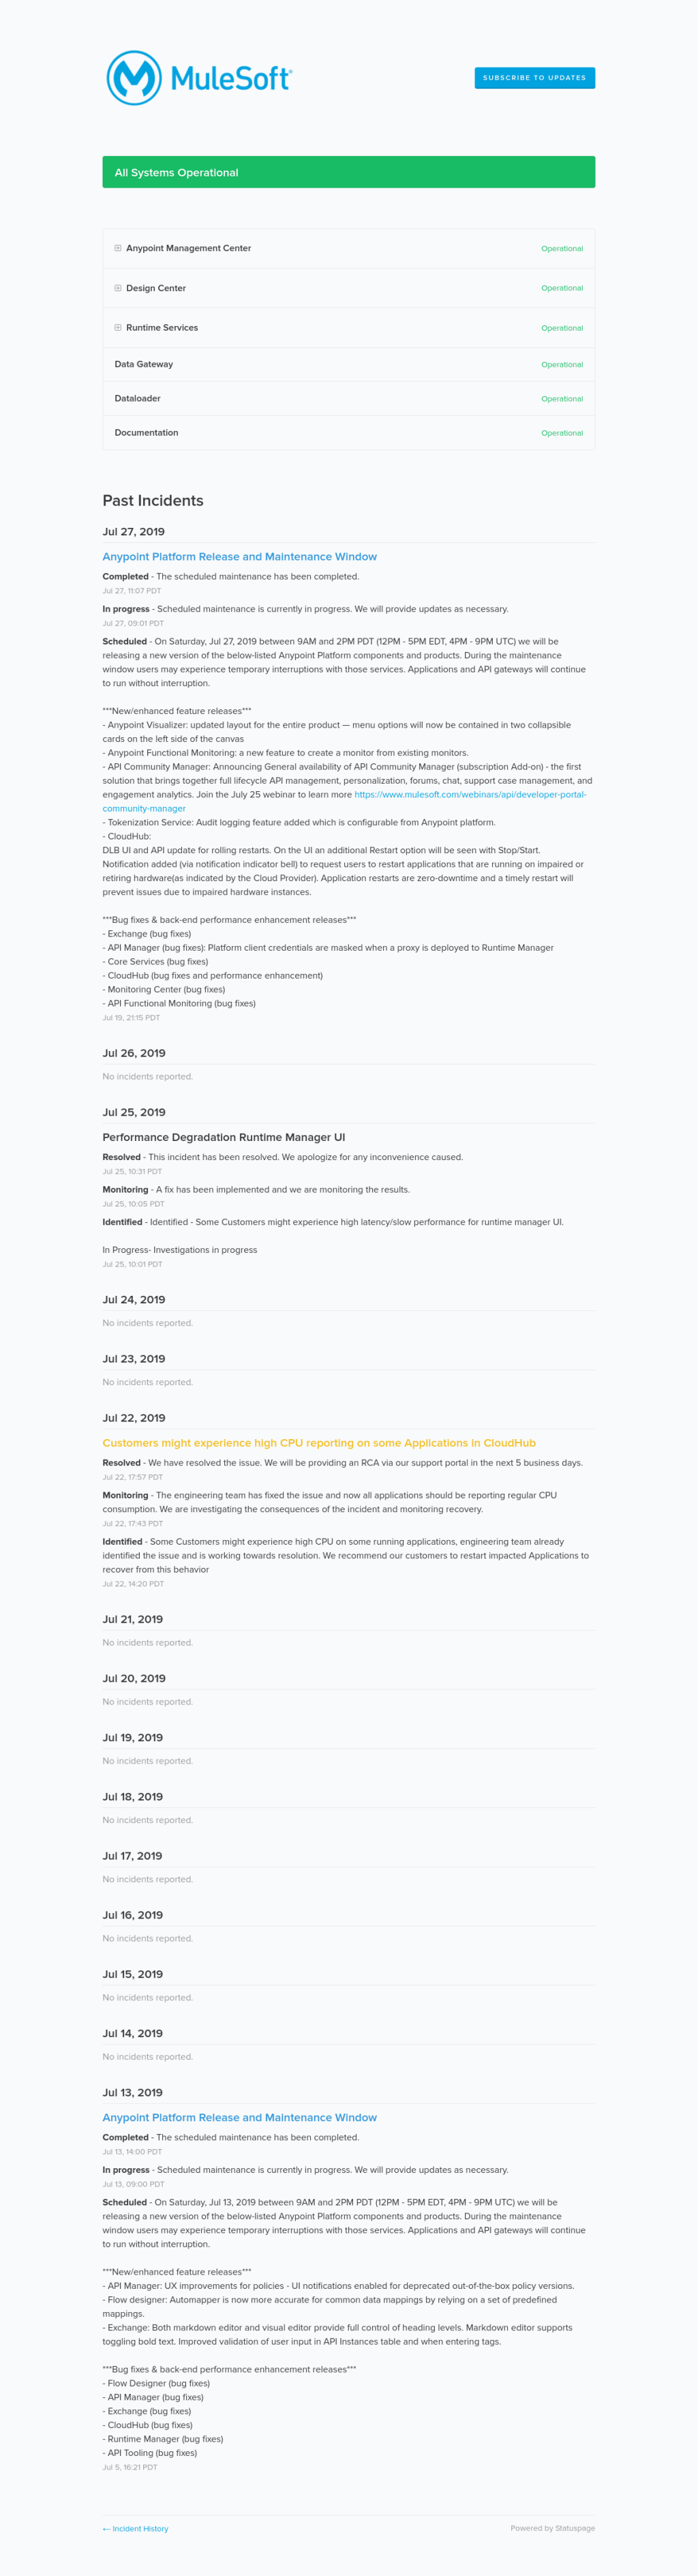 Mulesoft Anypoint Status